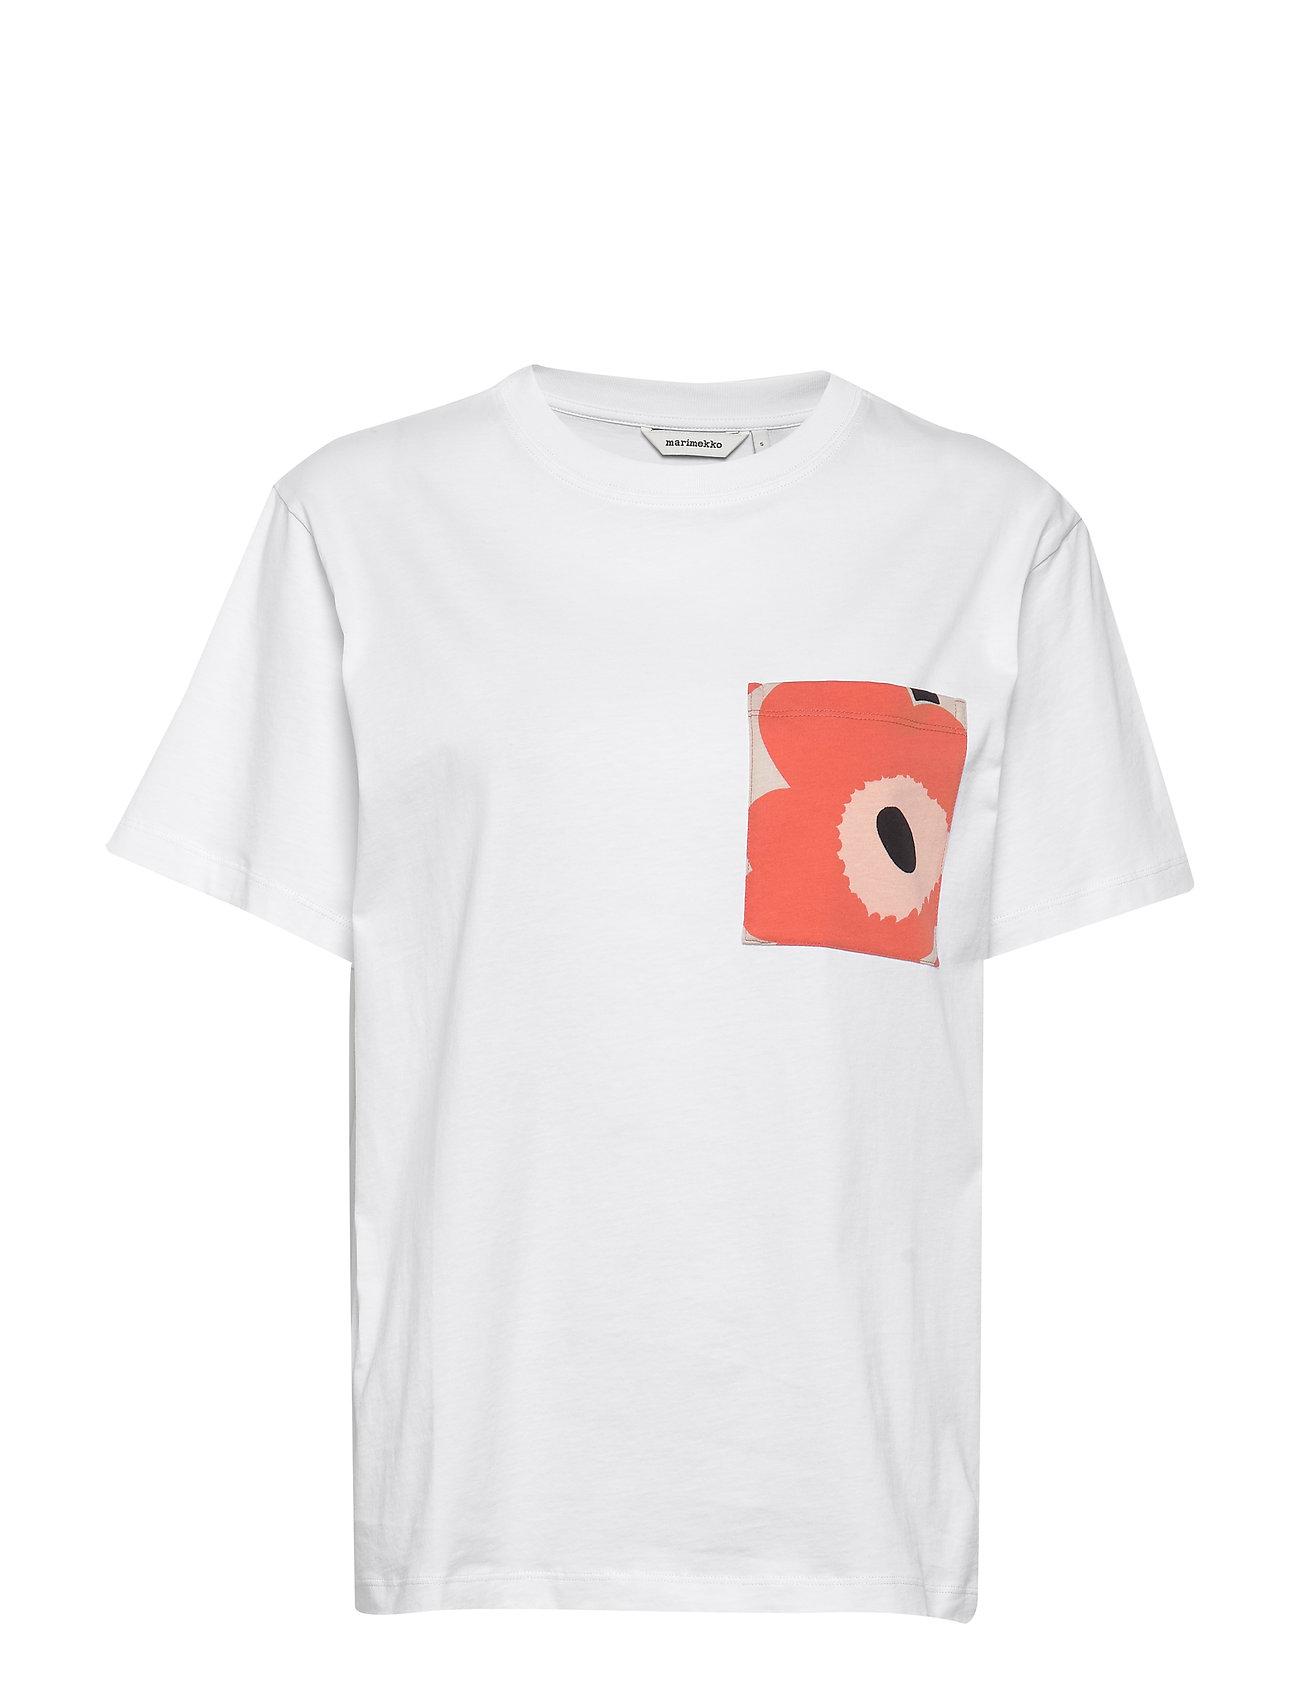 Marimekko HIEKKA SOLID T-shirt - WHITE, ORANGE